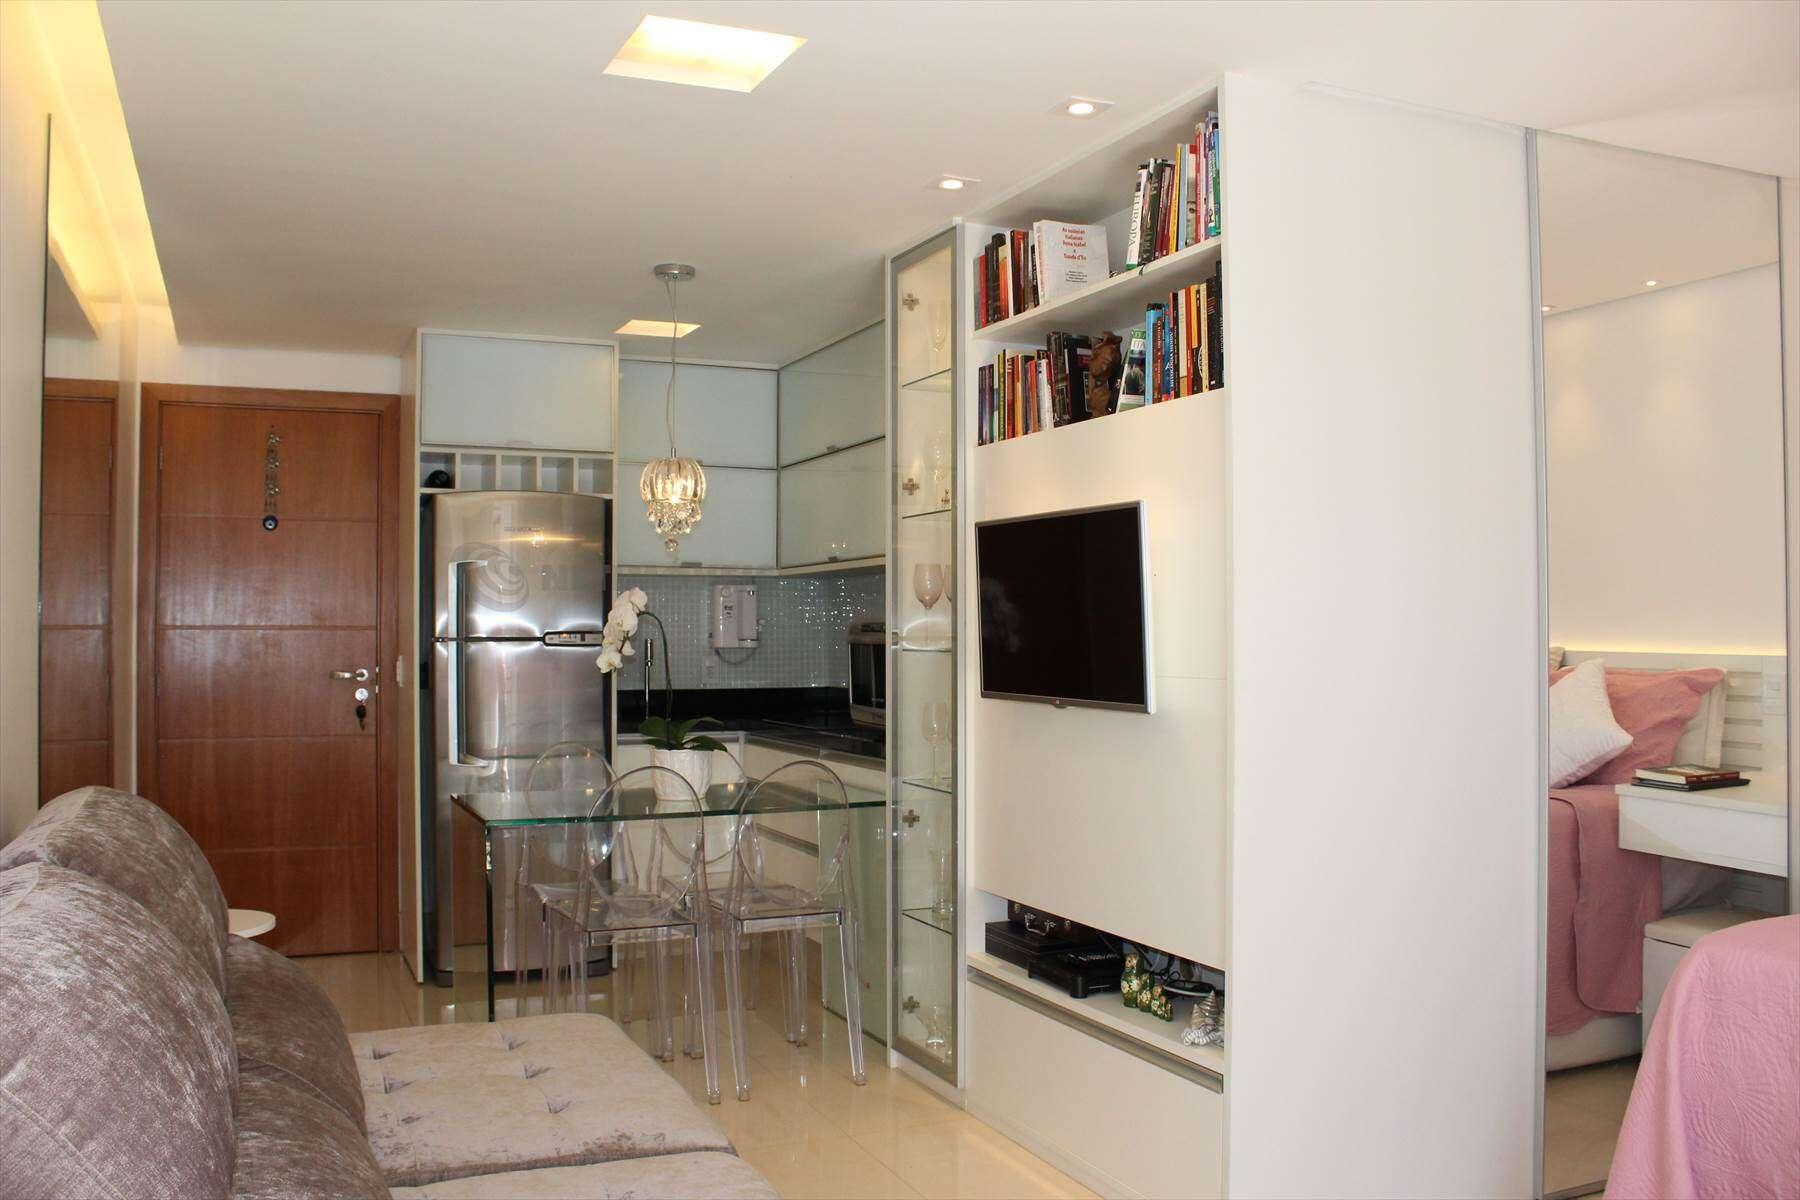 apartamento 1 quarto,apart-hotel,distrito federal,asa norte,brasília,